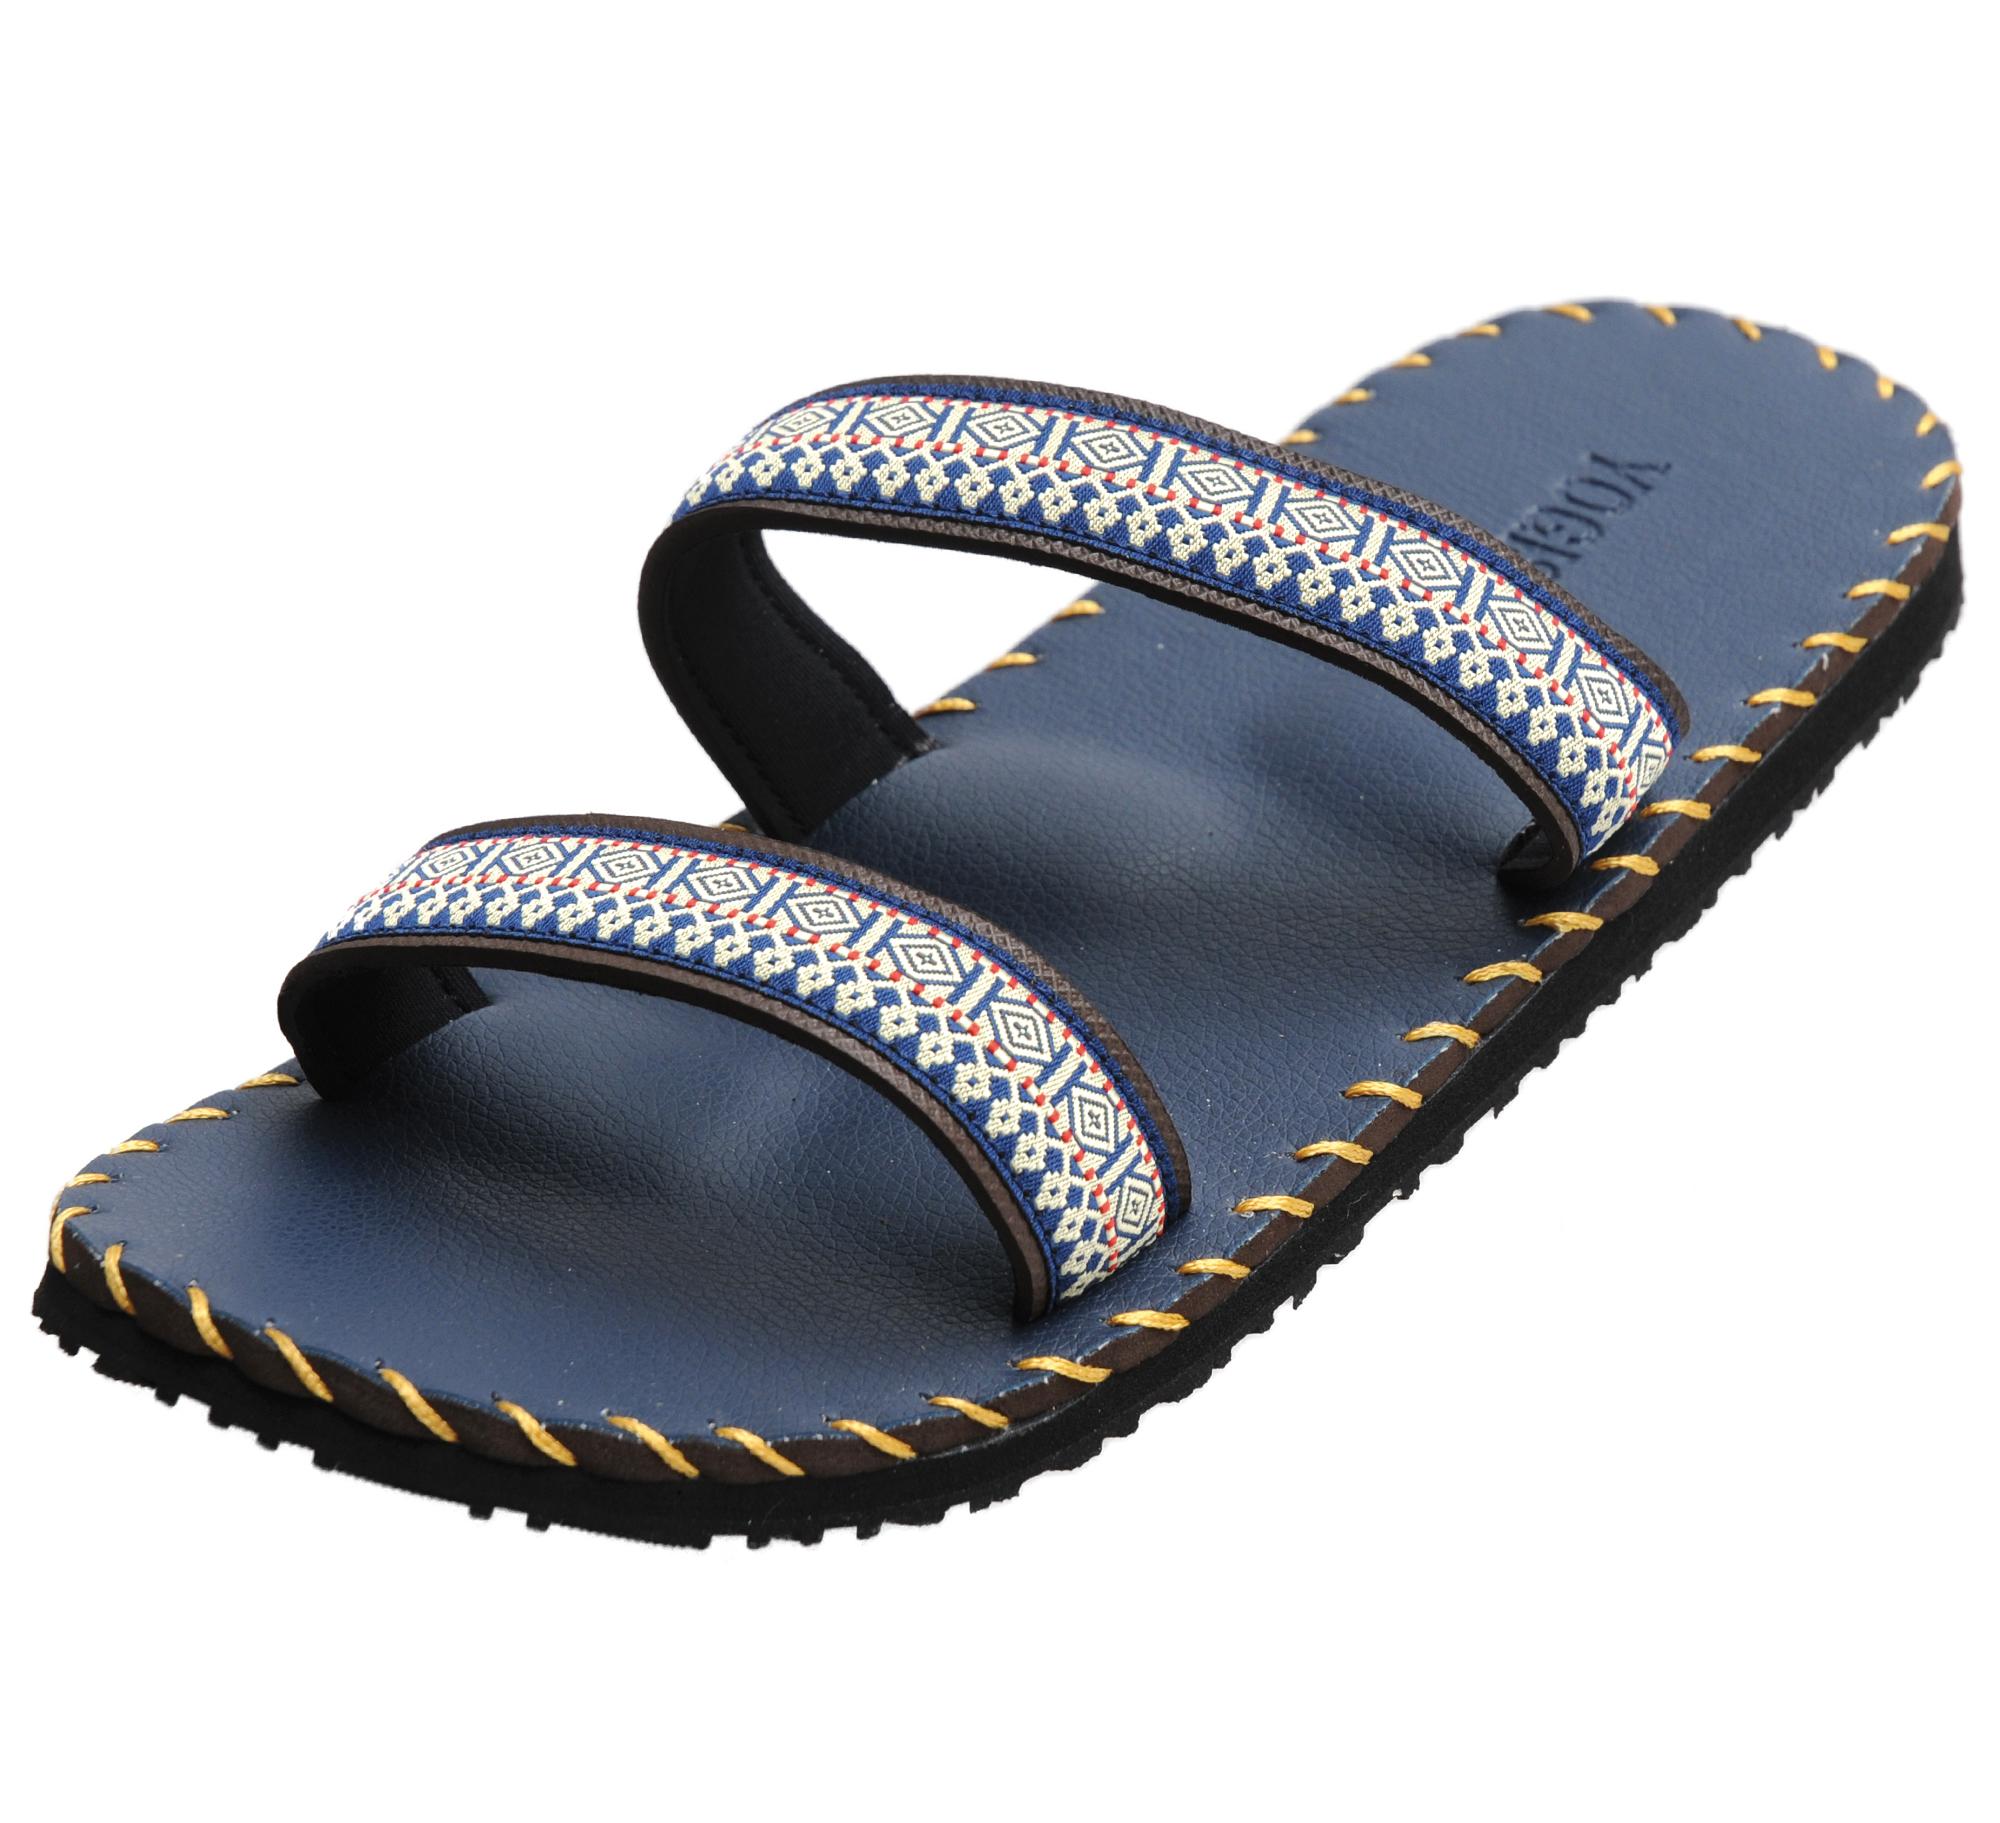 Yoga-Sandalen men - dark blue